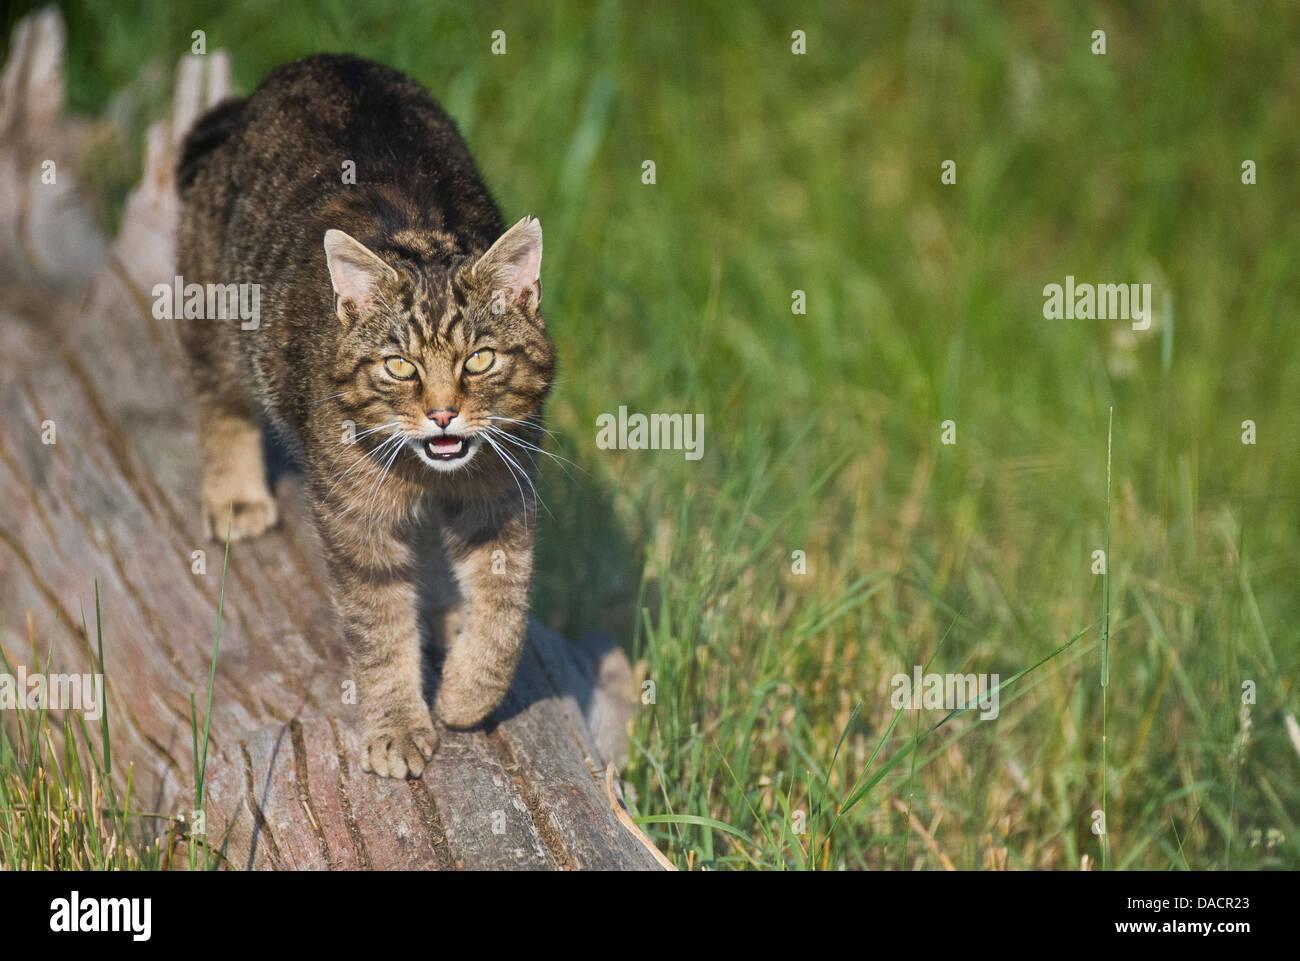 Scottish wildcat (Felis silvestris grampia) - Stock Image